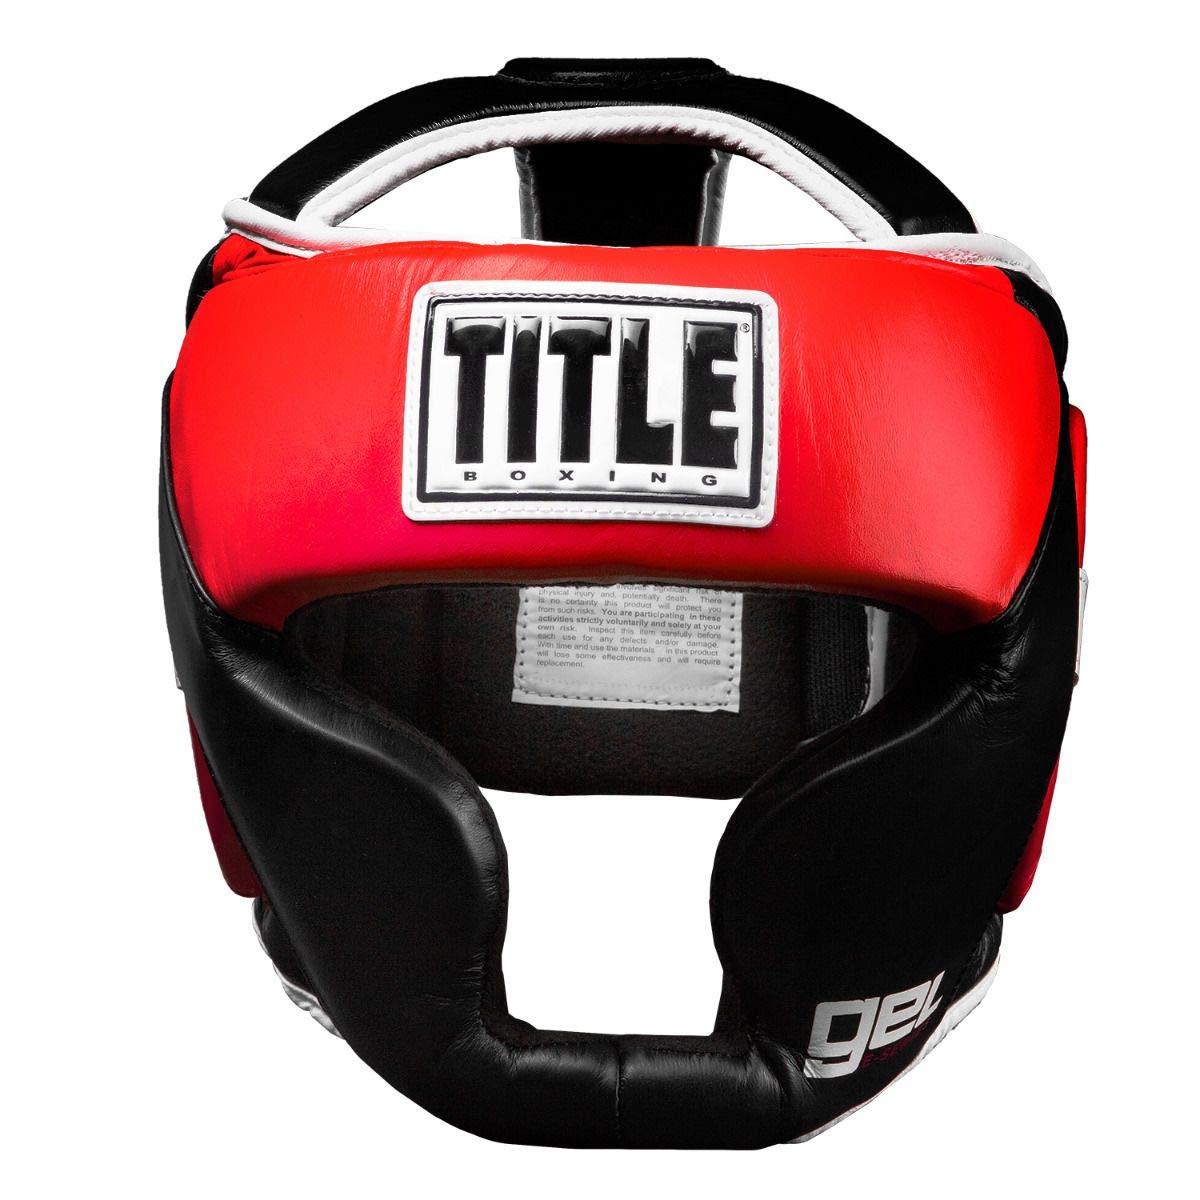 Title Boxing Gel E-Series Full Headgear